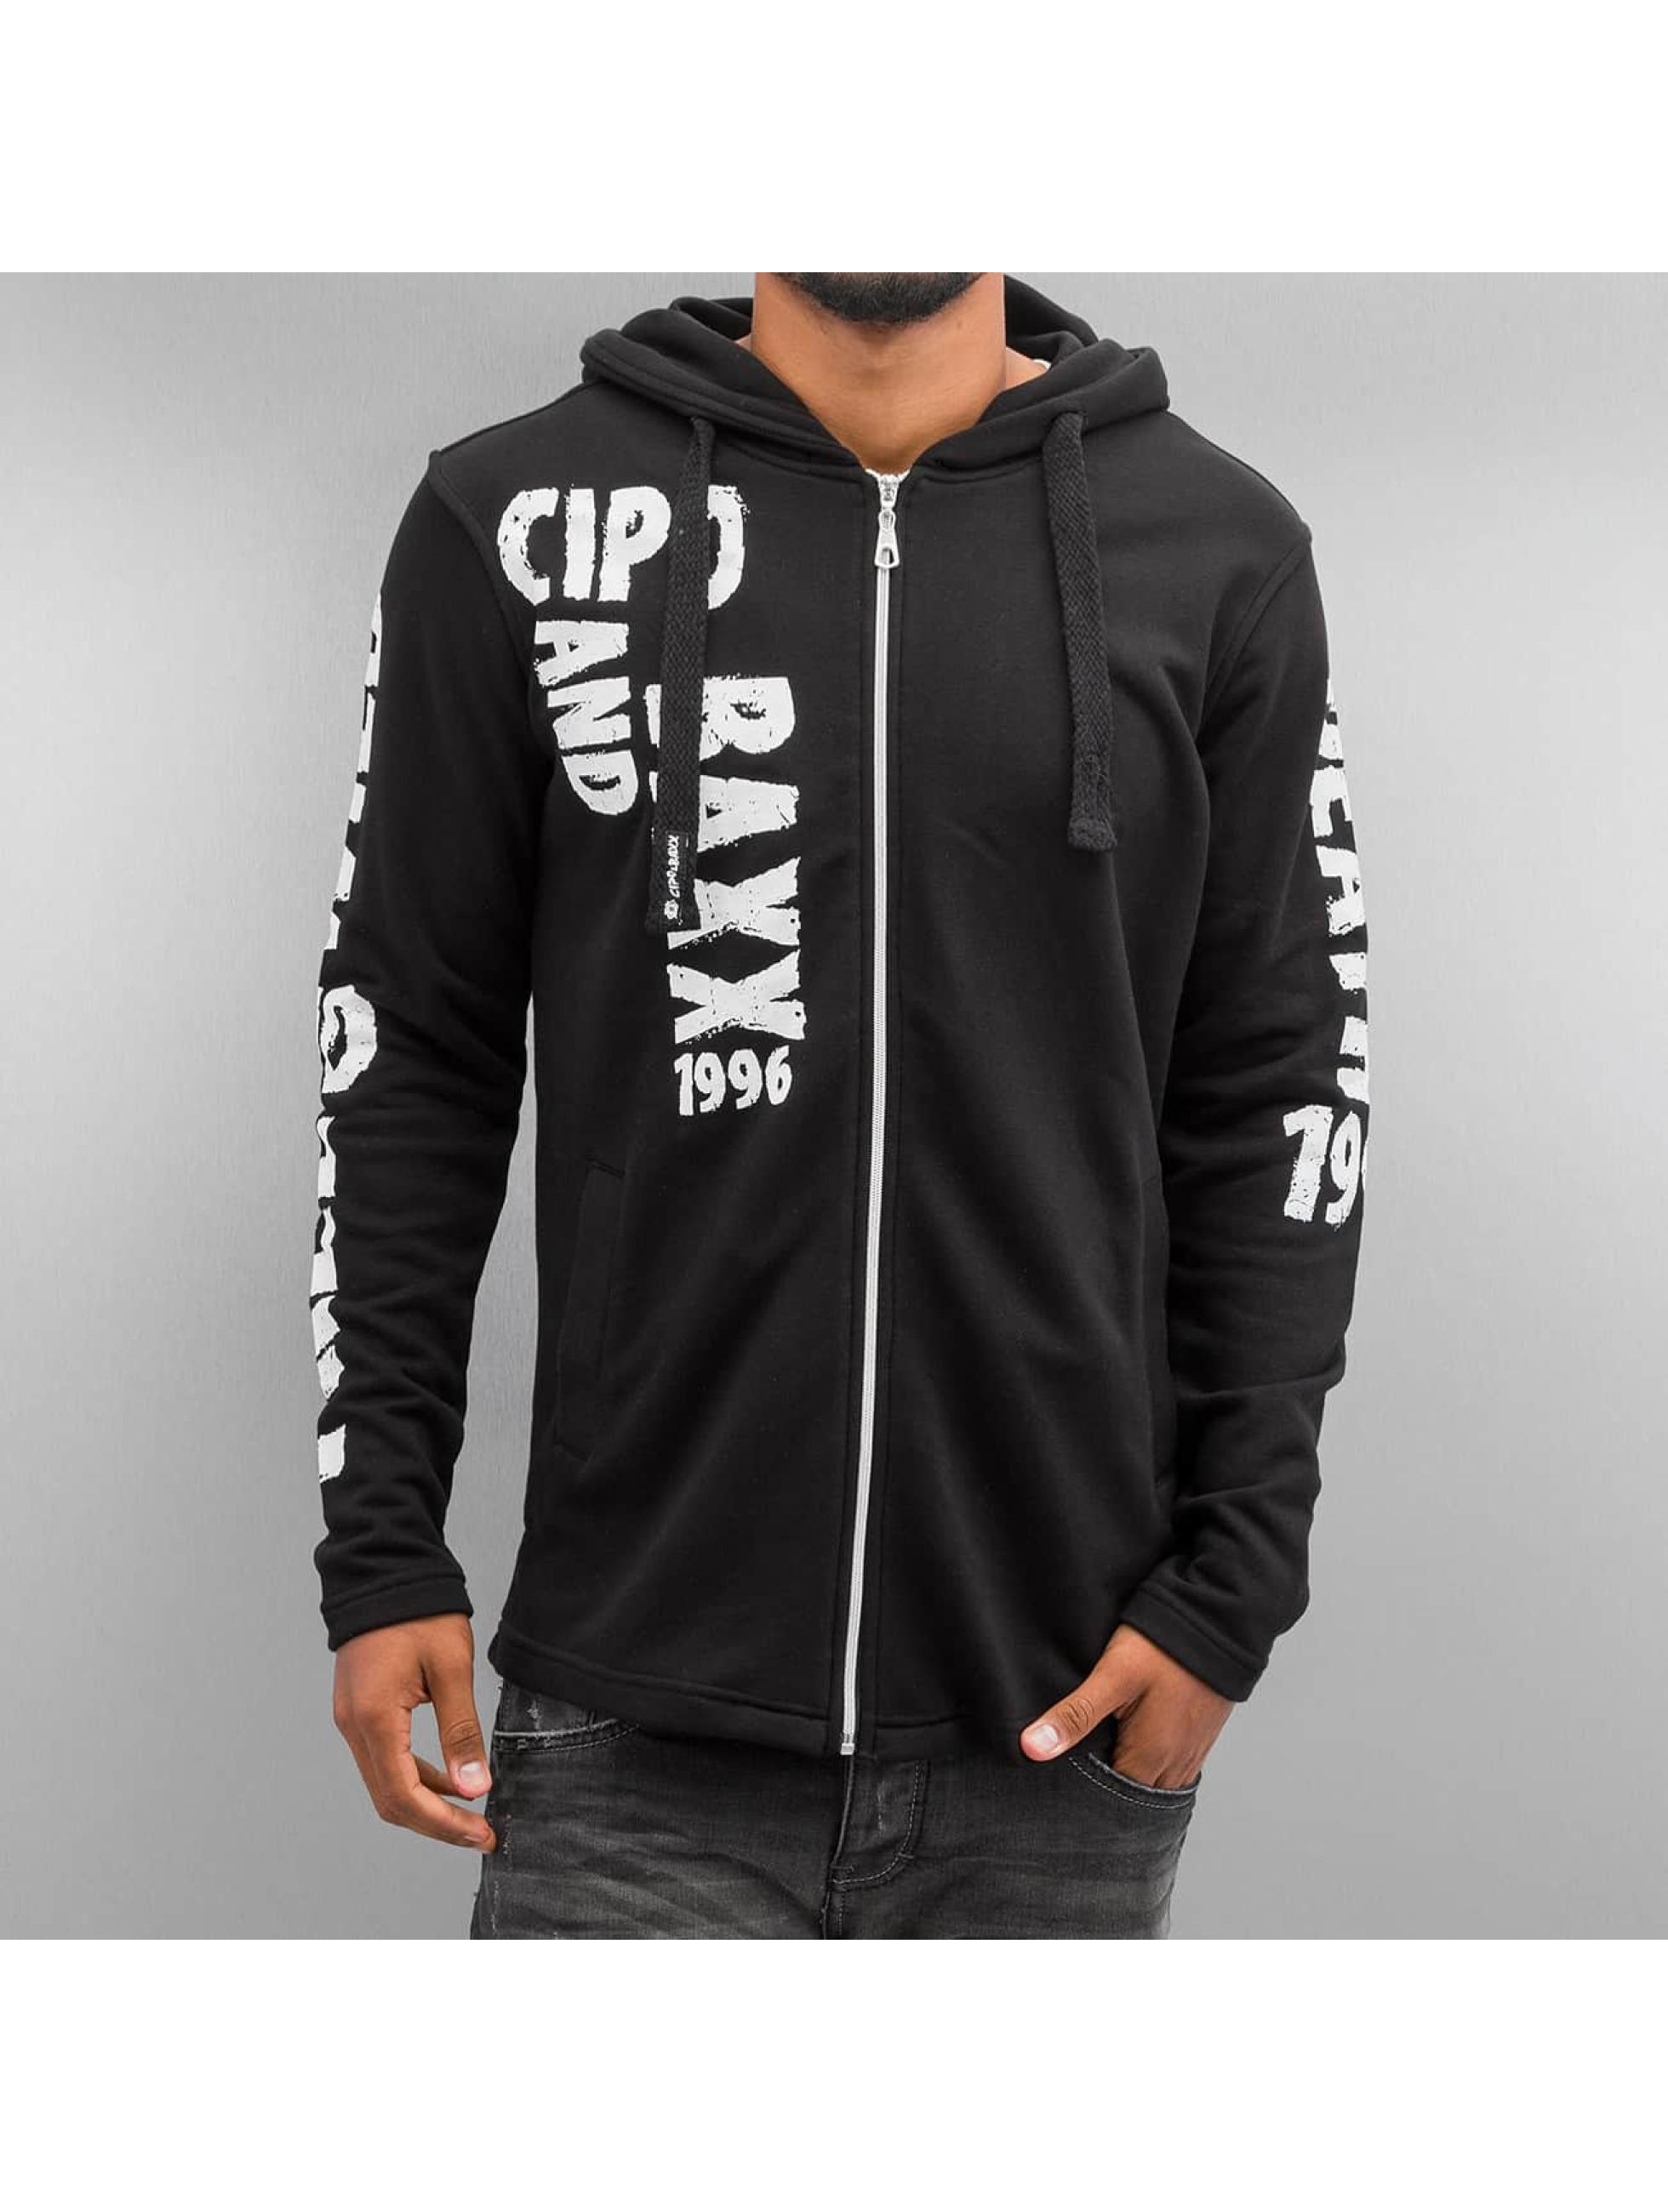 Cipo & Baxx Zip Hoodie Free And Wild черный